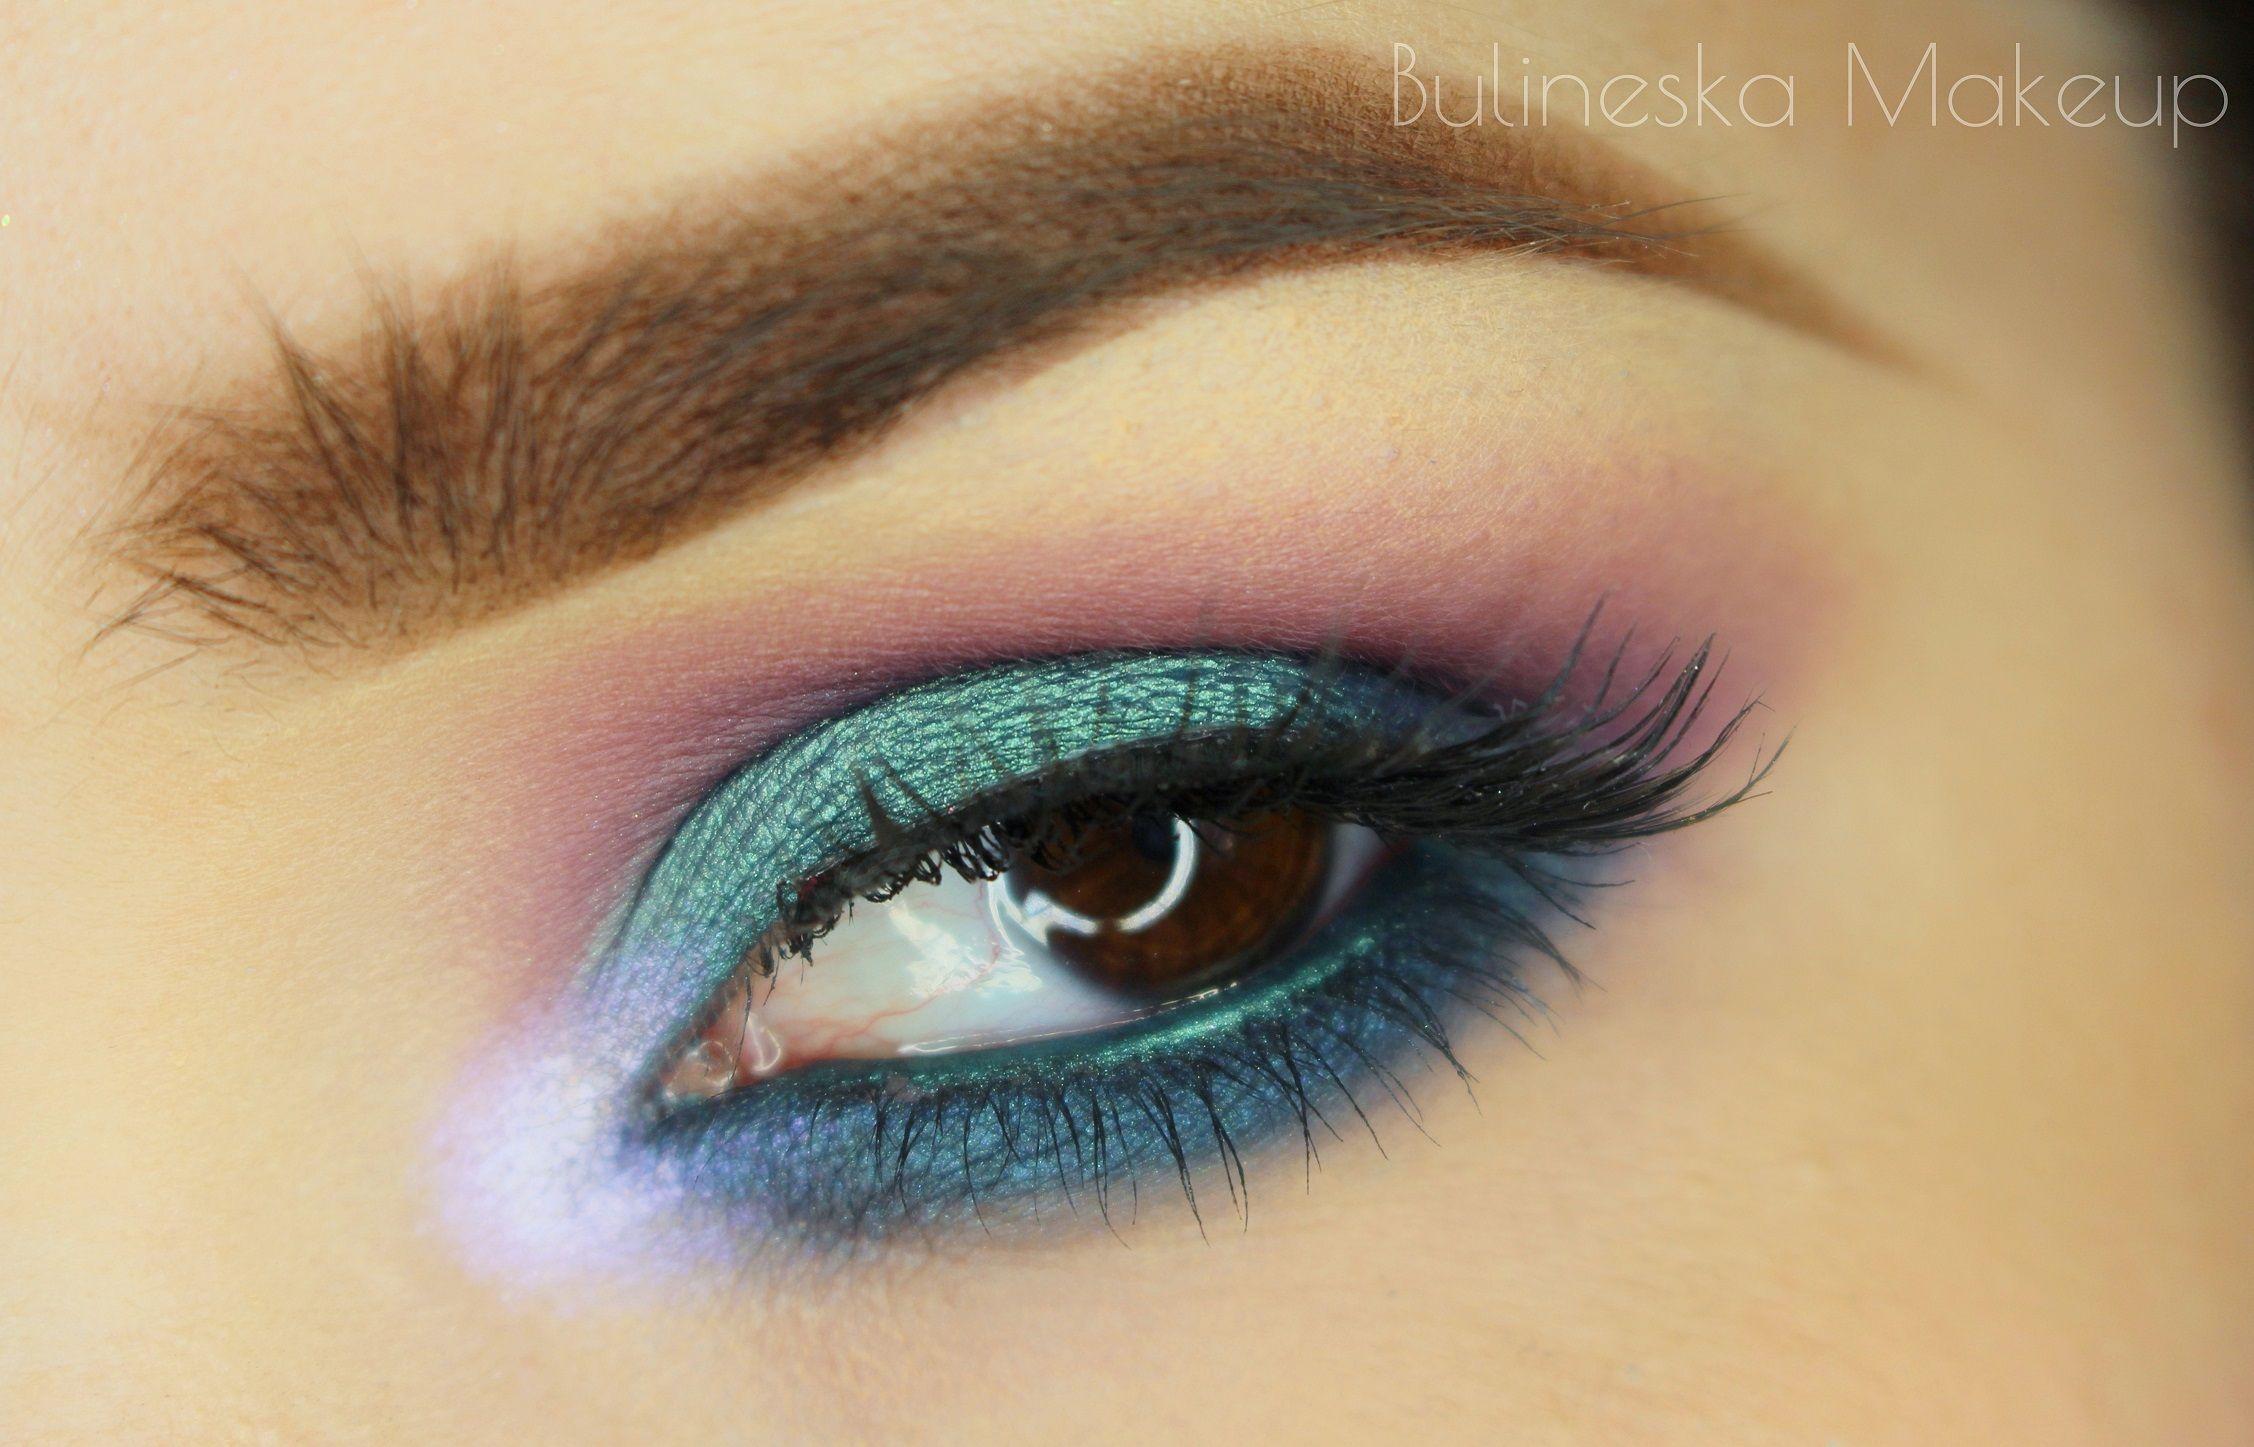 Sea urchin makeup tutorial by bulineska on makeup geek sea urchin makeup tutorial by bulineska on makeup geek baditri Choice Image